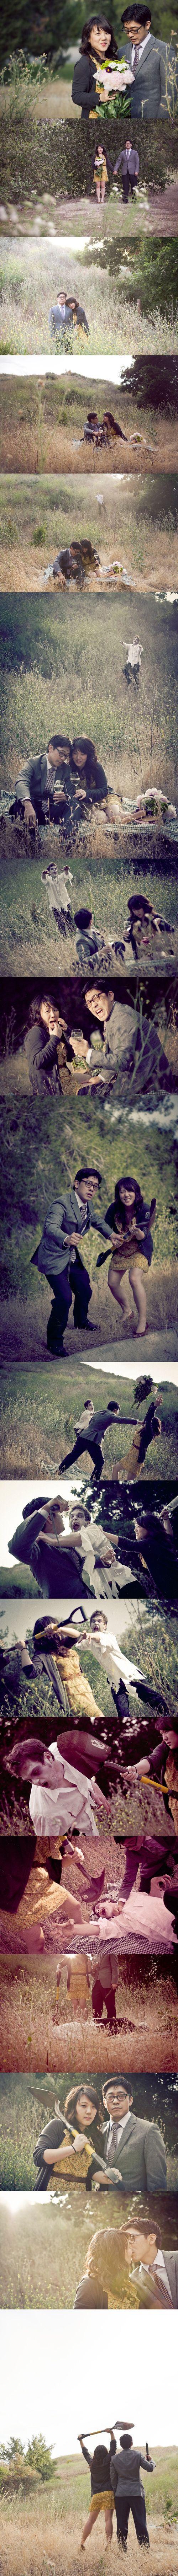 Zombie engagement shoot....